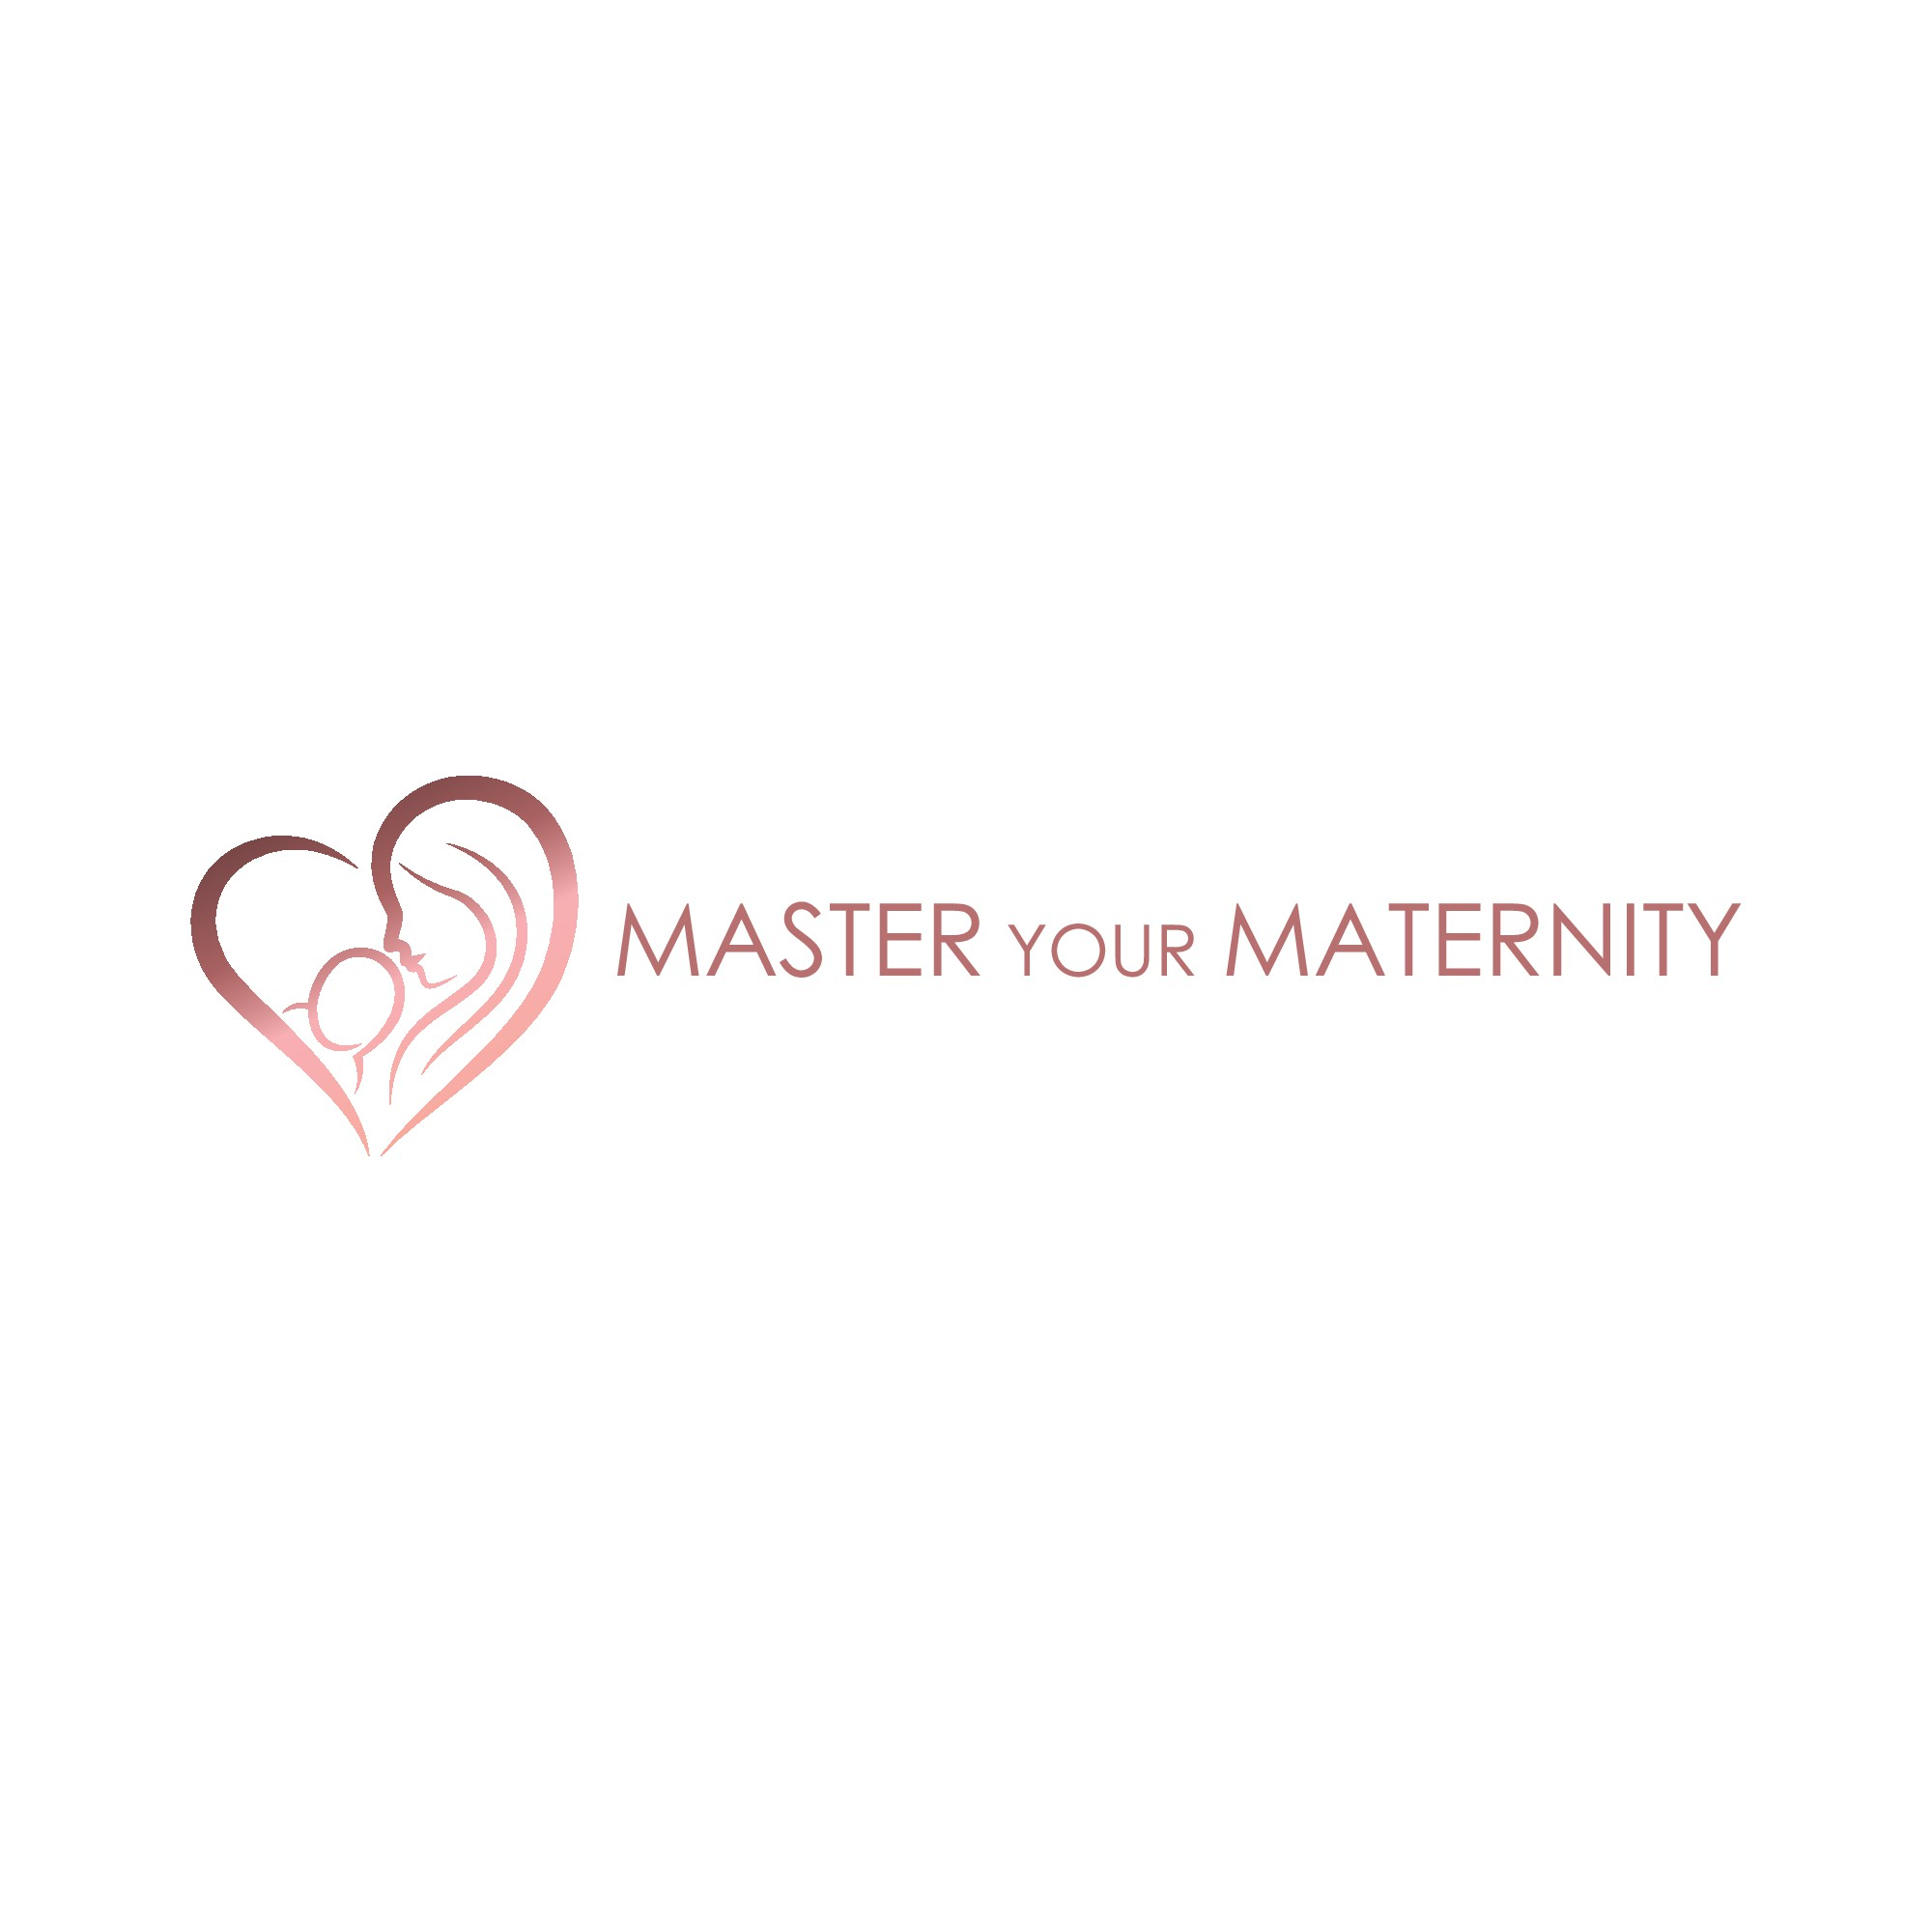 Master your maternity logo